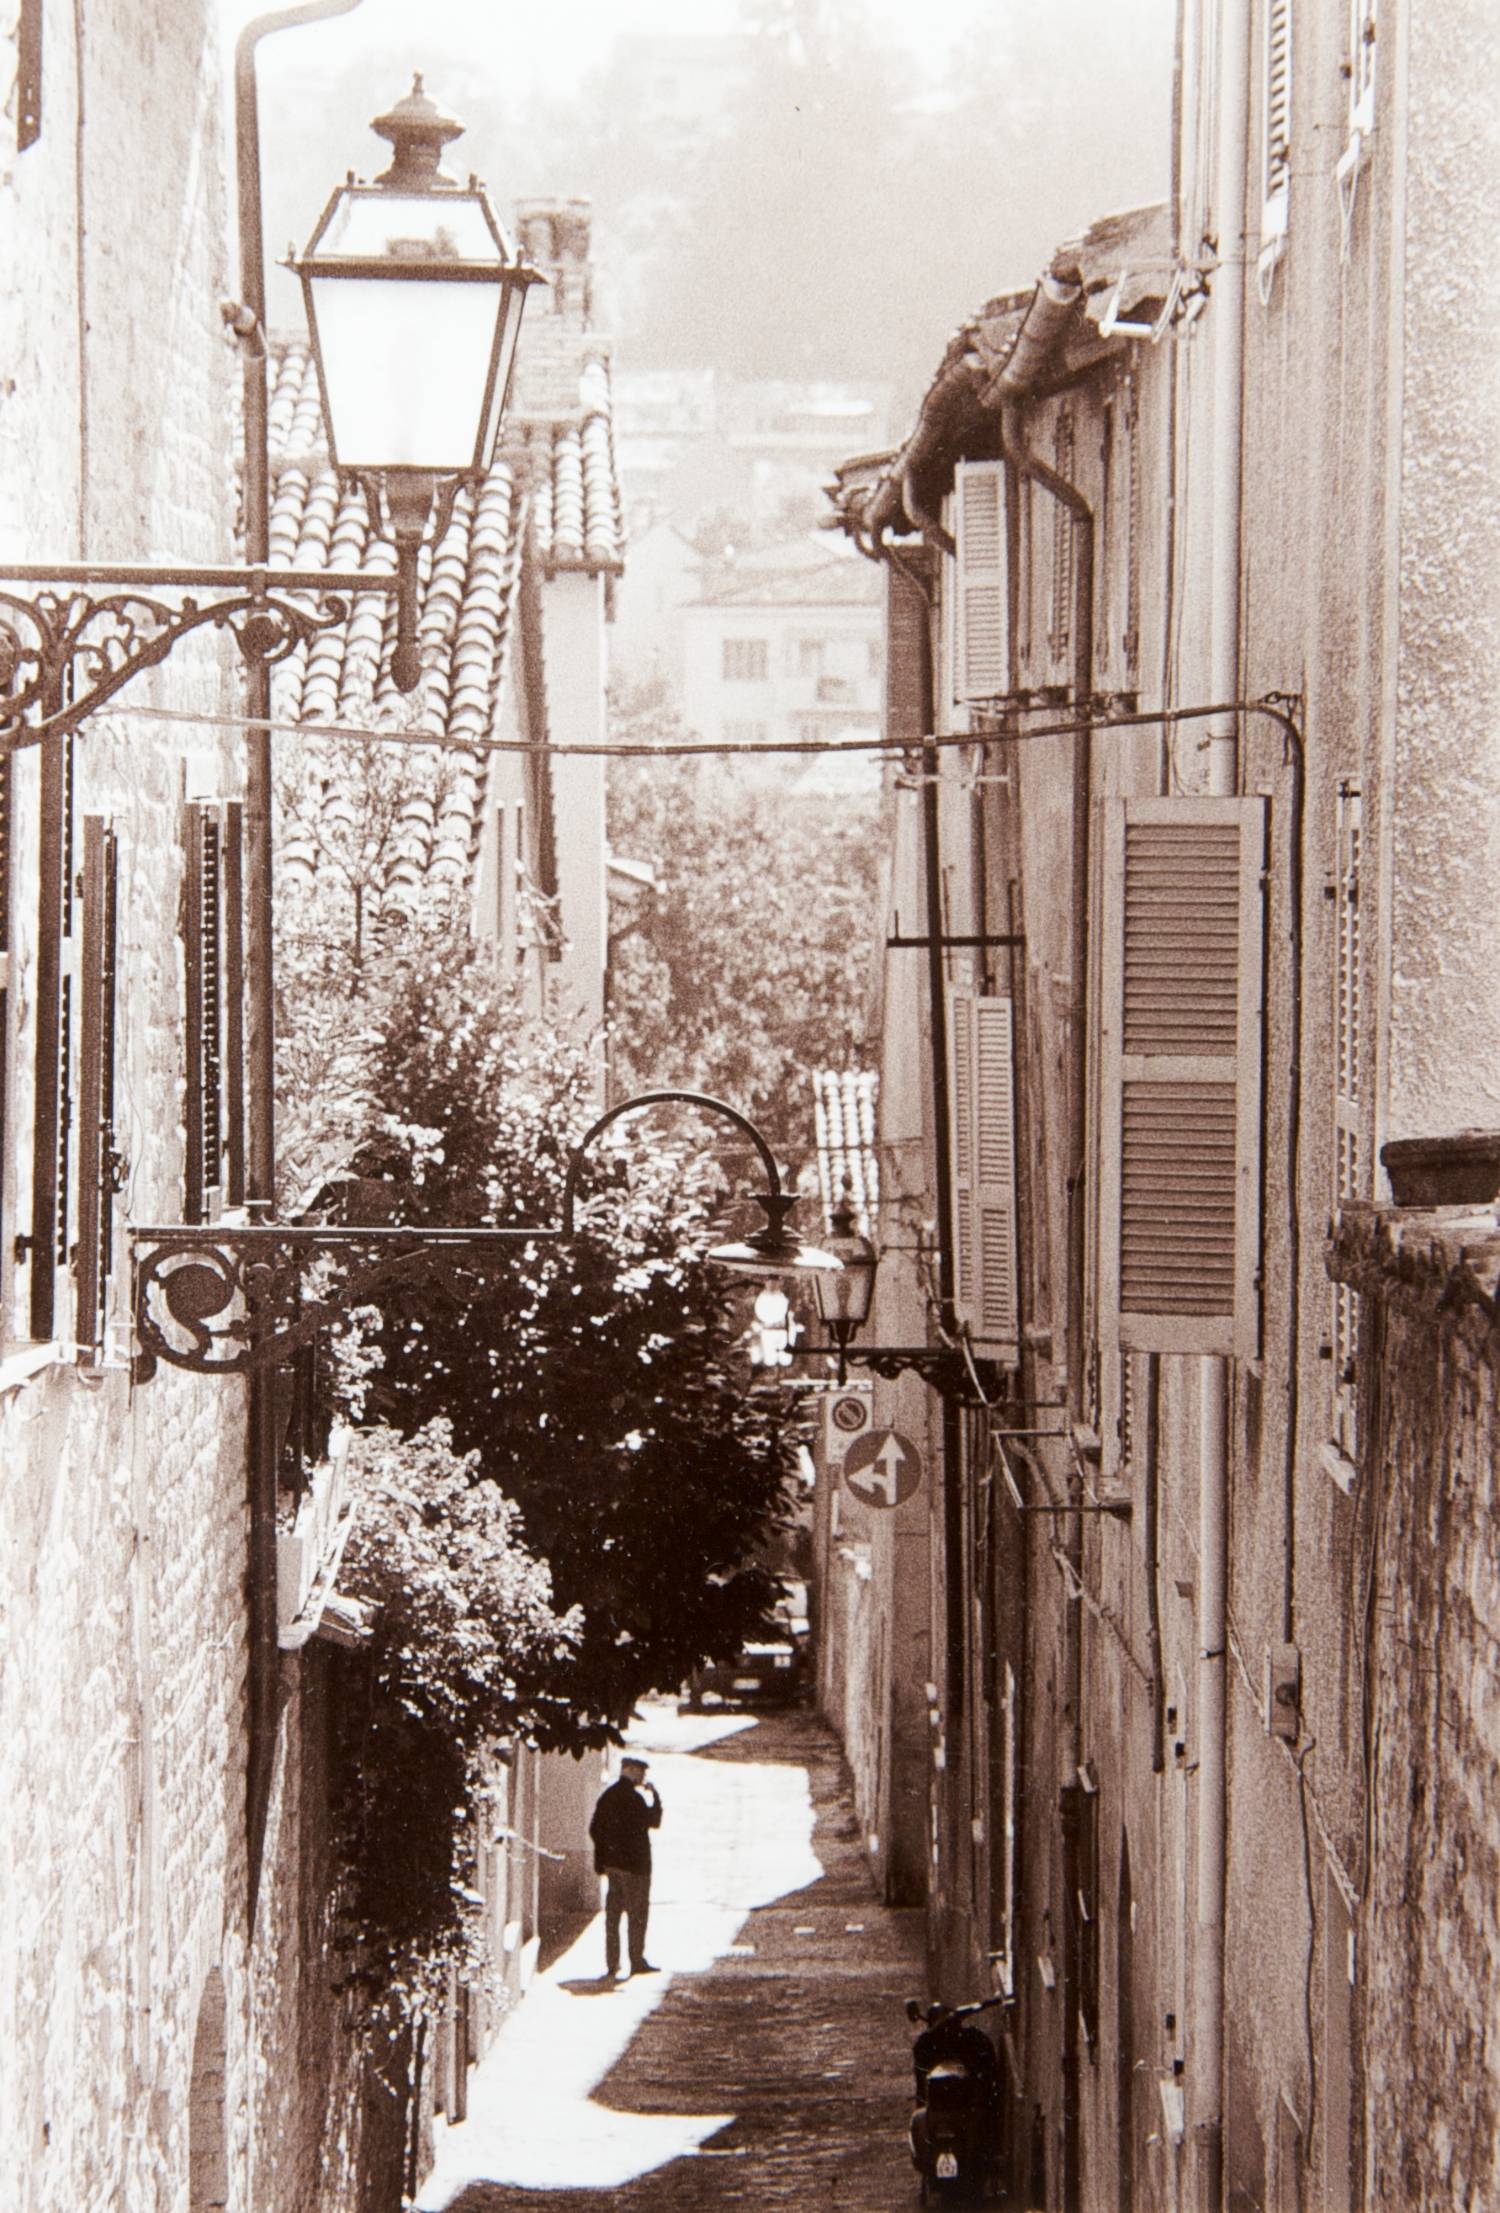 Morning in Cagli (Italy)